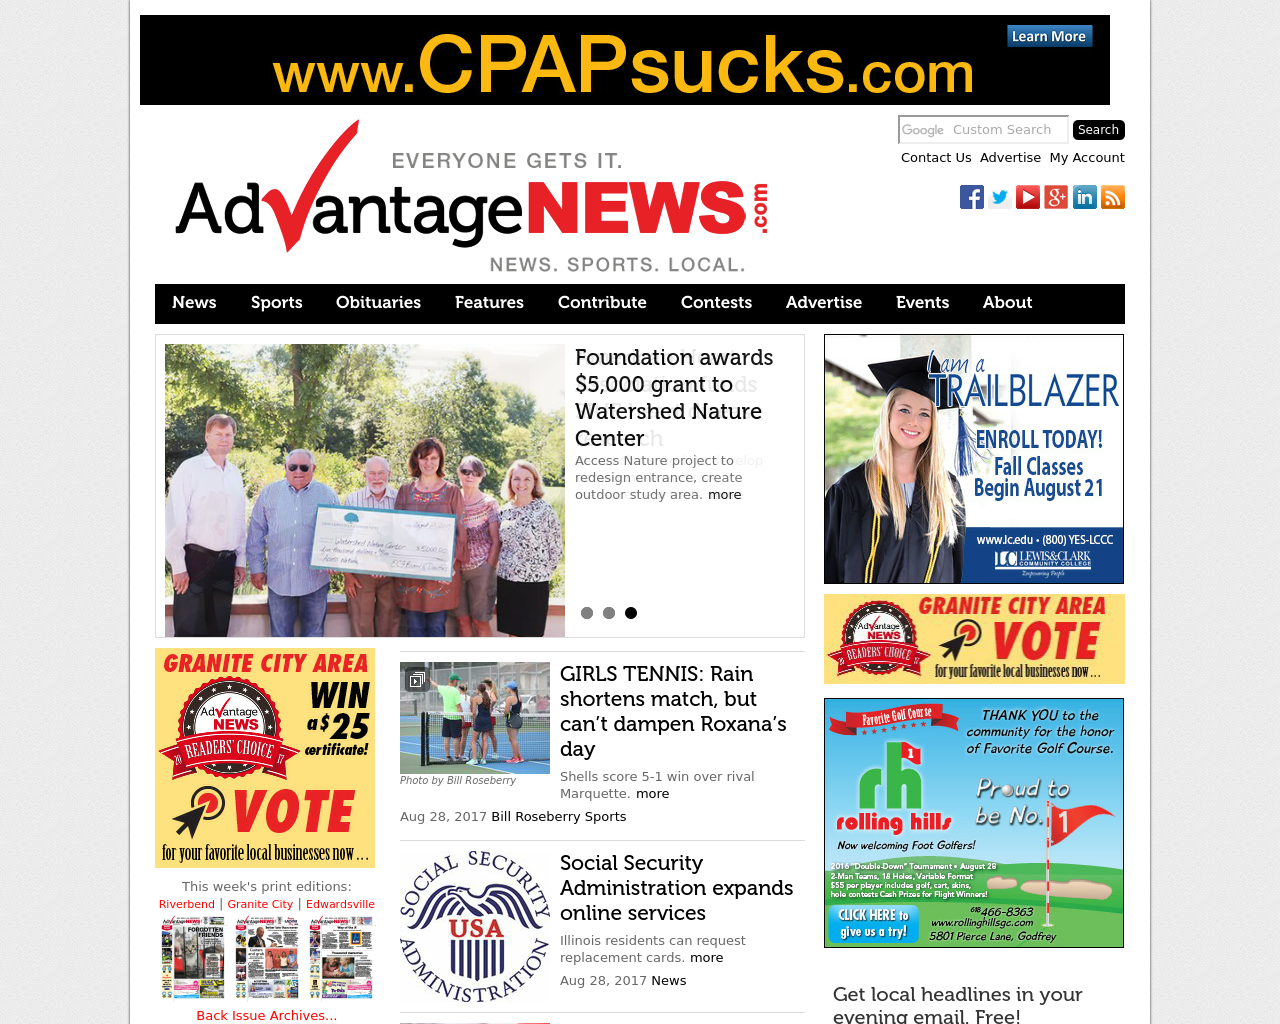 Advantage-NEWS-Advertising-Reviews-Pricing